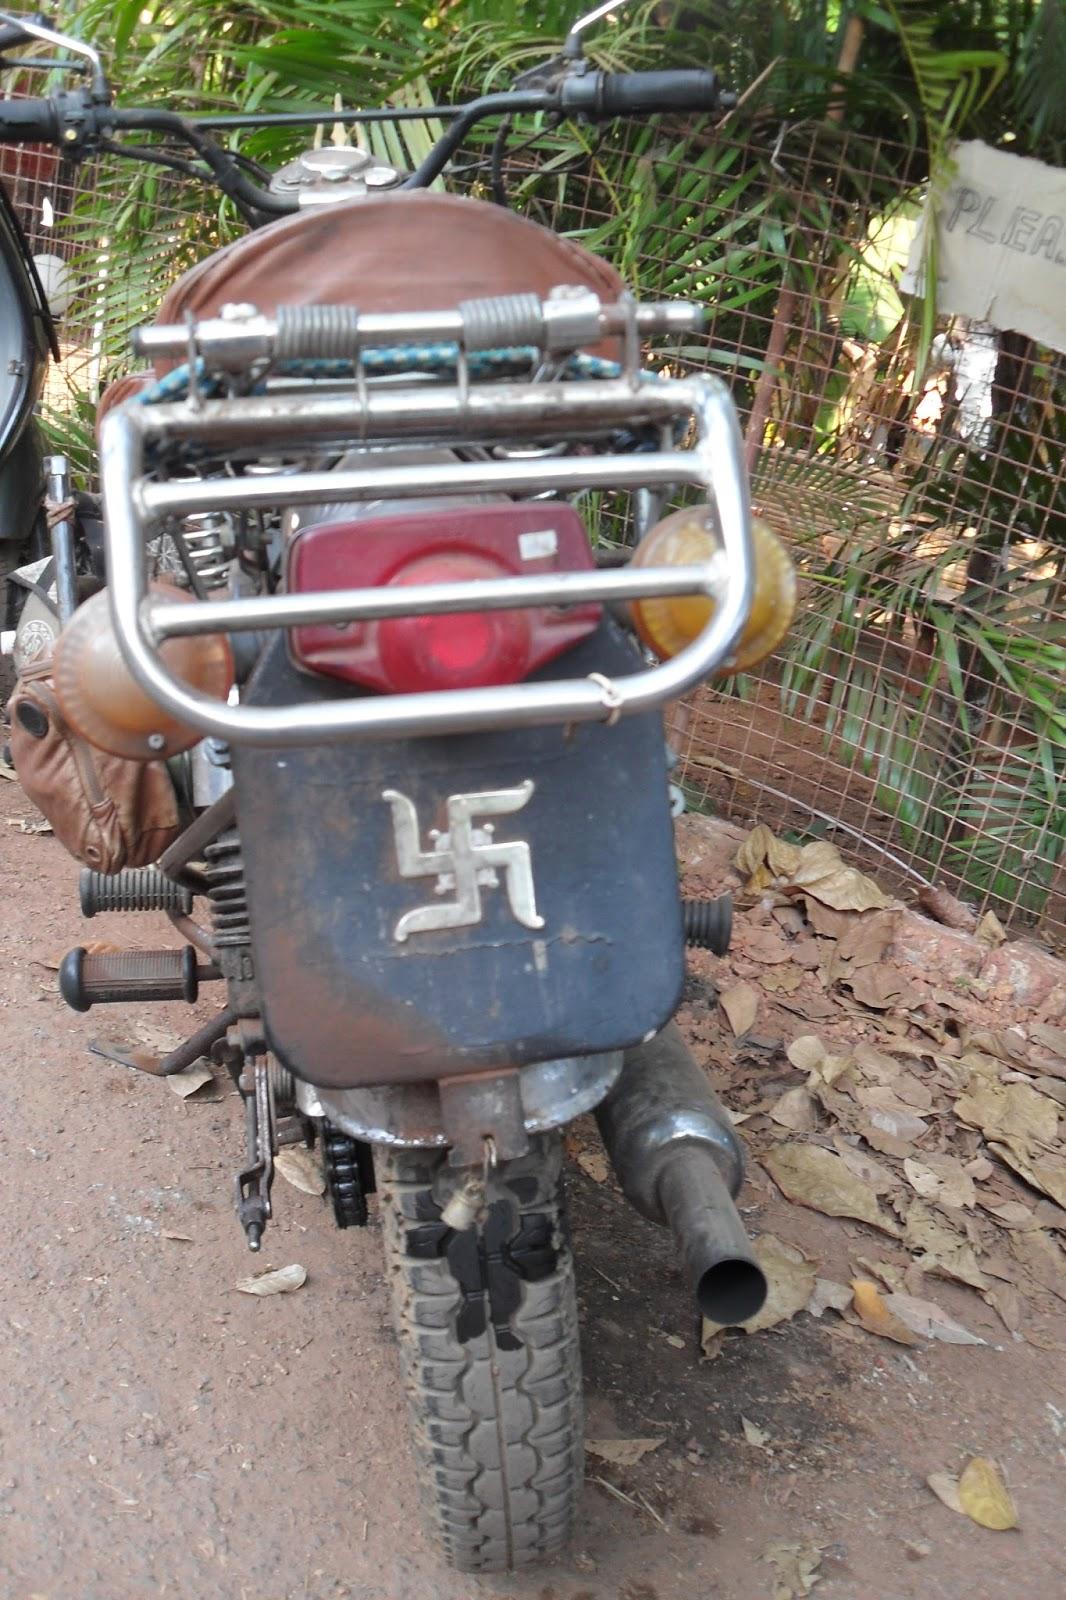 Знак свастики на брызговике мотоцикла